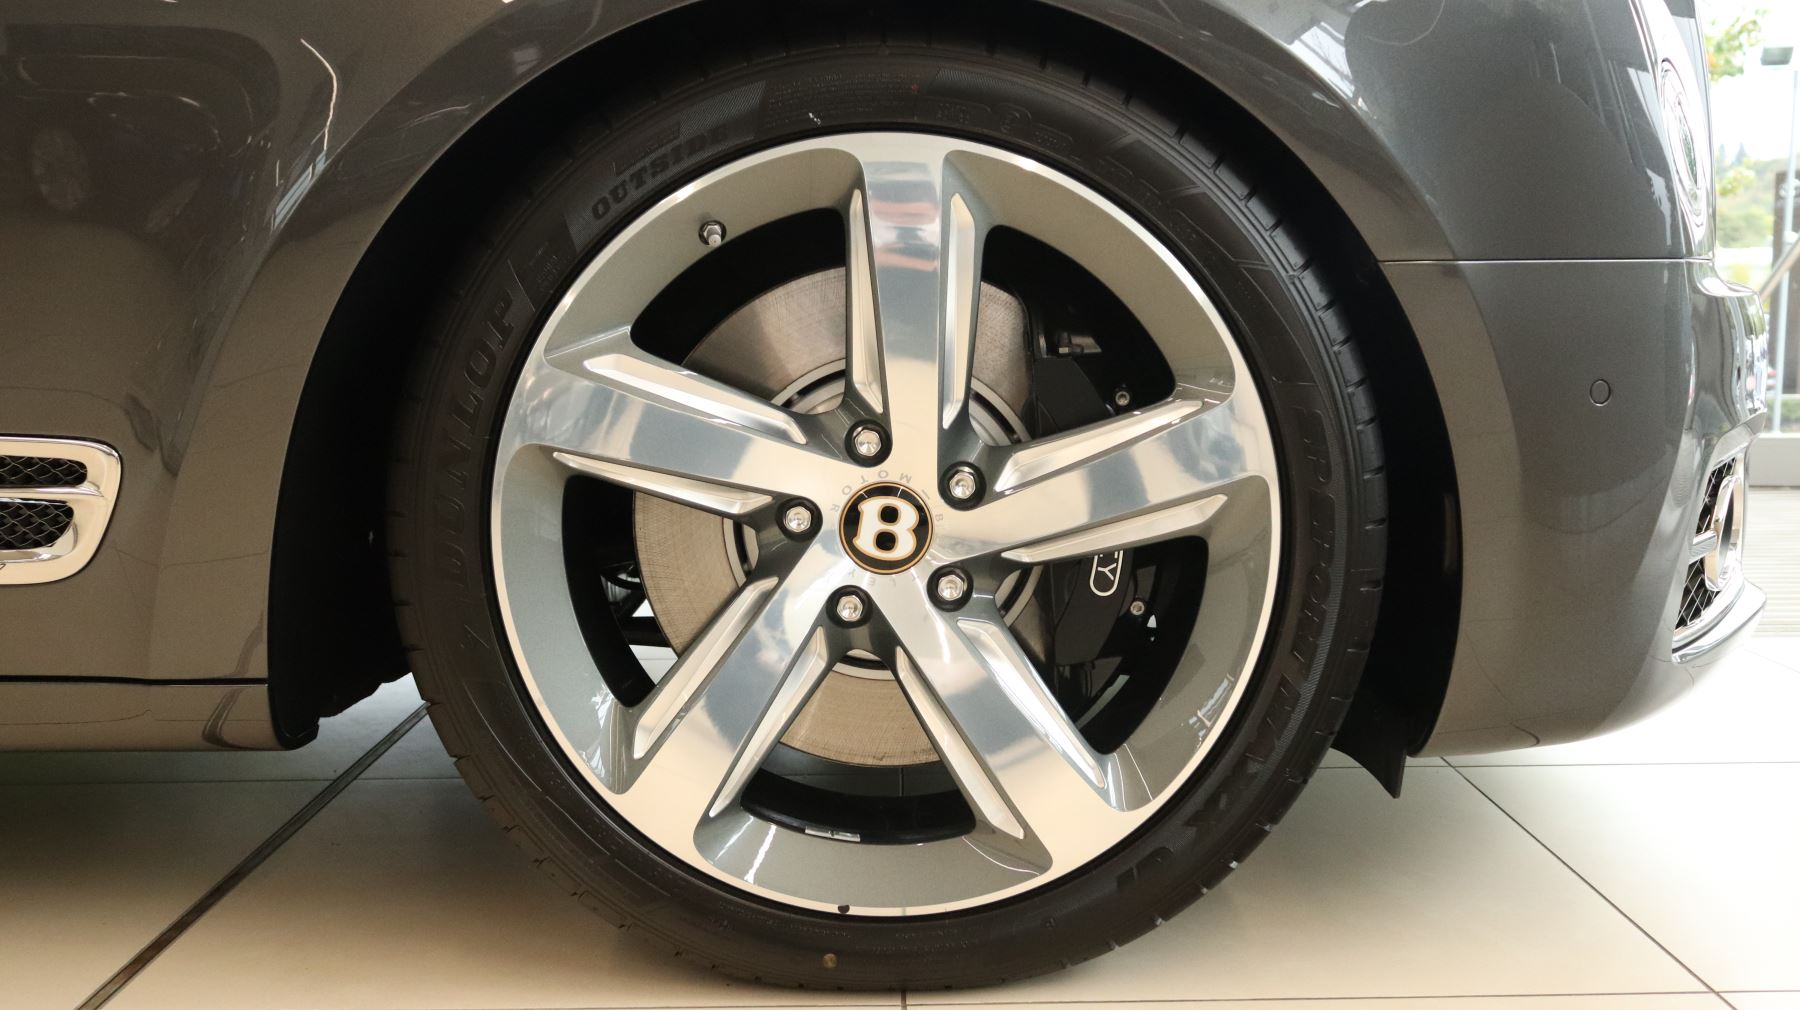 Bentley Mulsanne Speed 6.8 V8 Speed Auto image 5